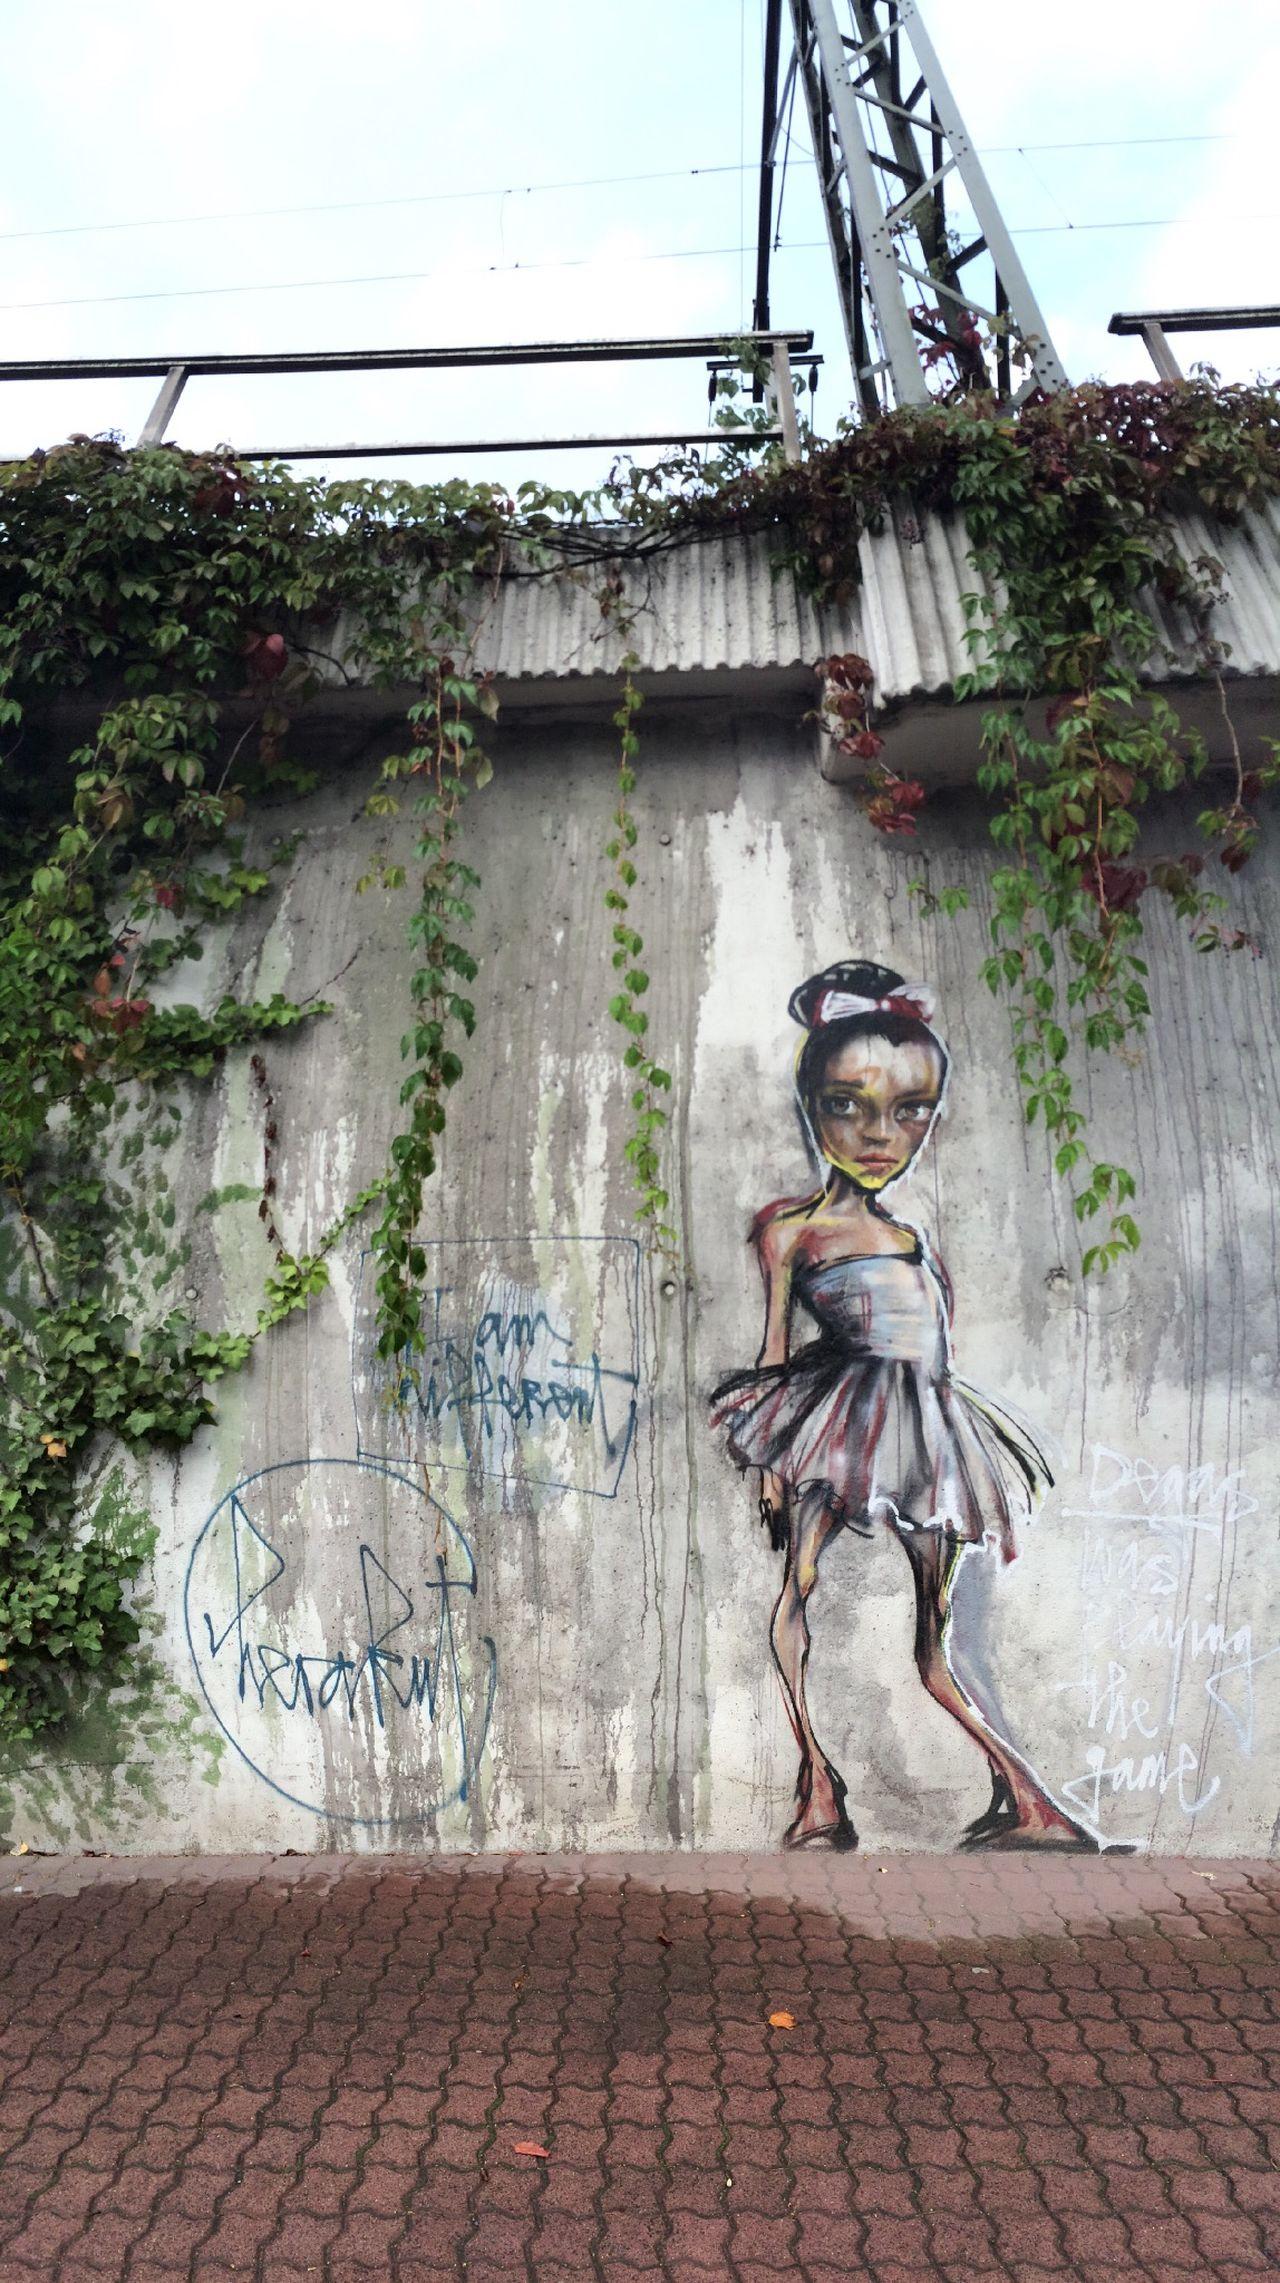 Degas was playing the game. Graffiti Mural (feat. Edgar Degas) in Bad Vilbel by Street Art Duo 'Herakut'.